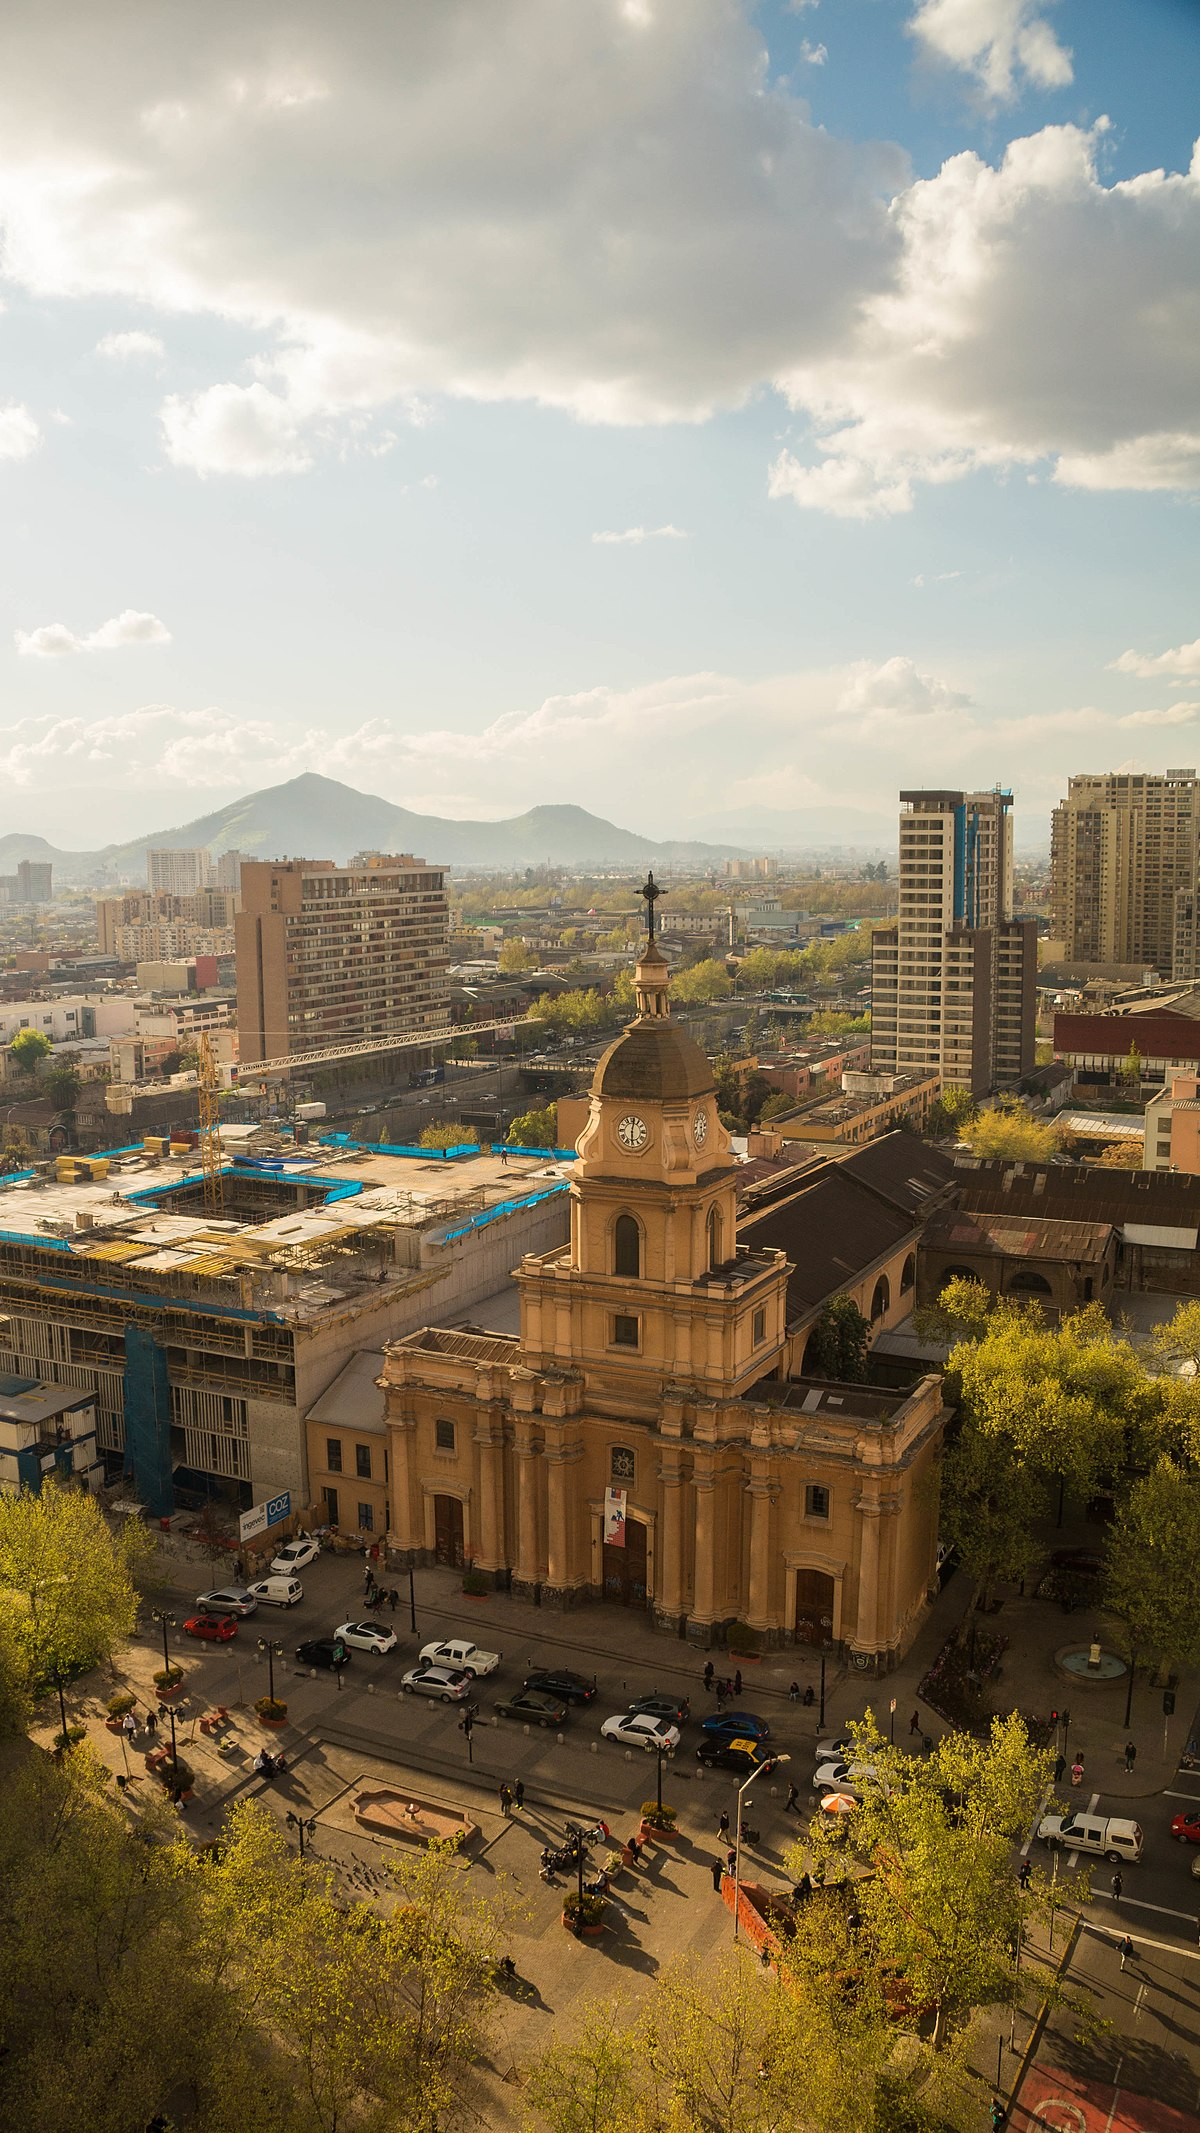 Iglesia de santa ana santiago de chile wikipedia la for Construccion de piscinas santiago chile